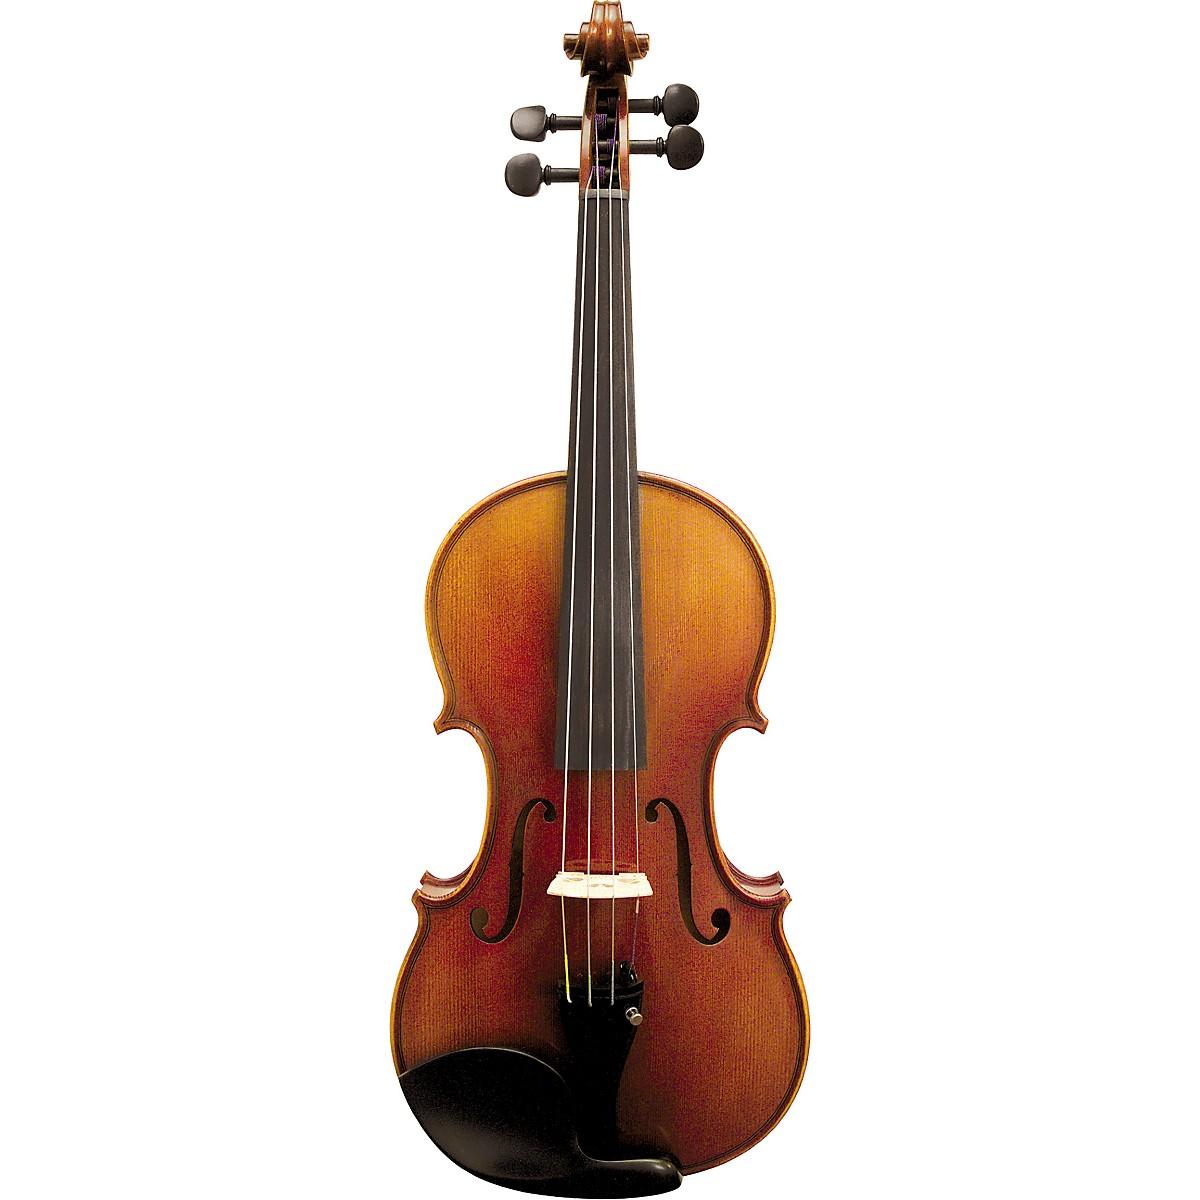 Karl Willhelm Model 55 Violin